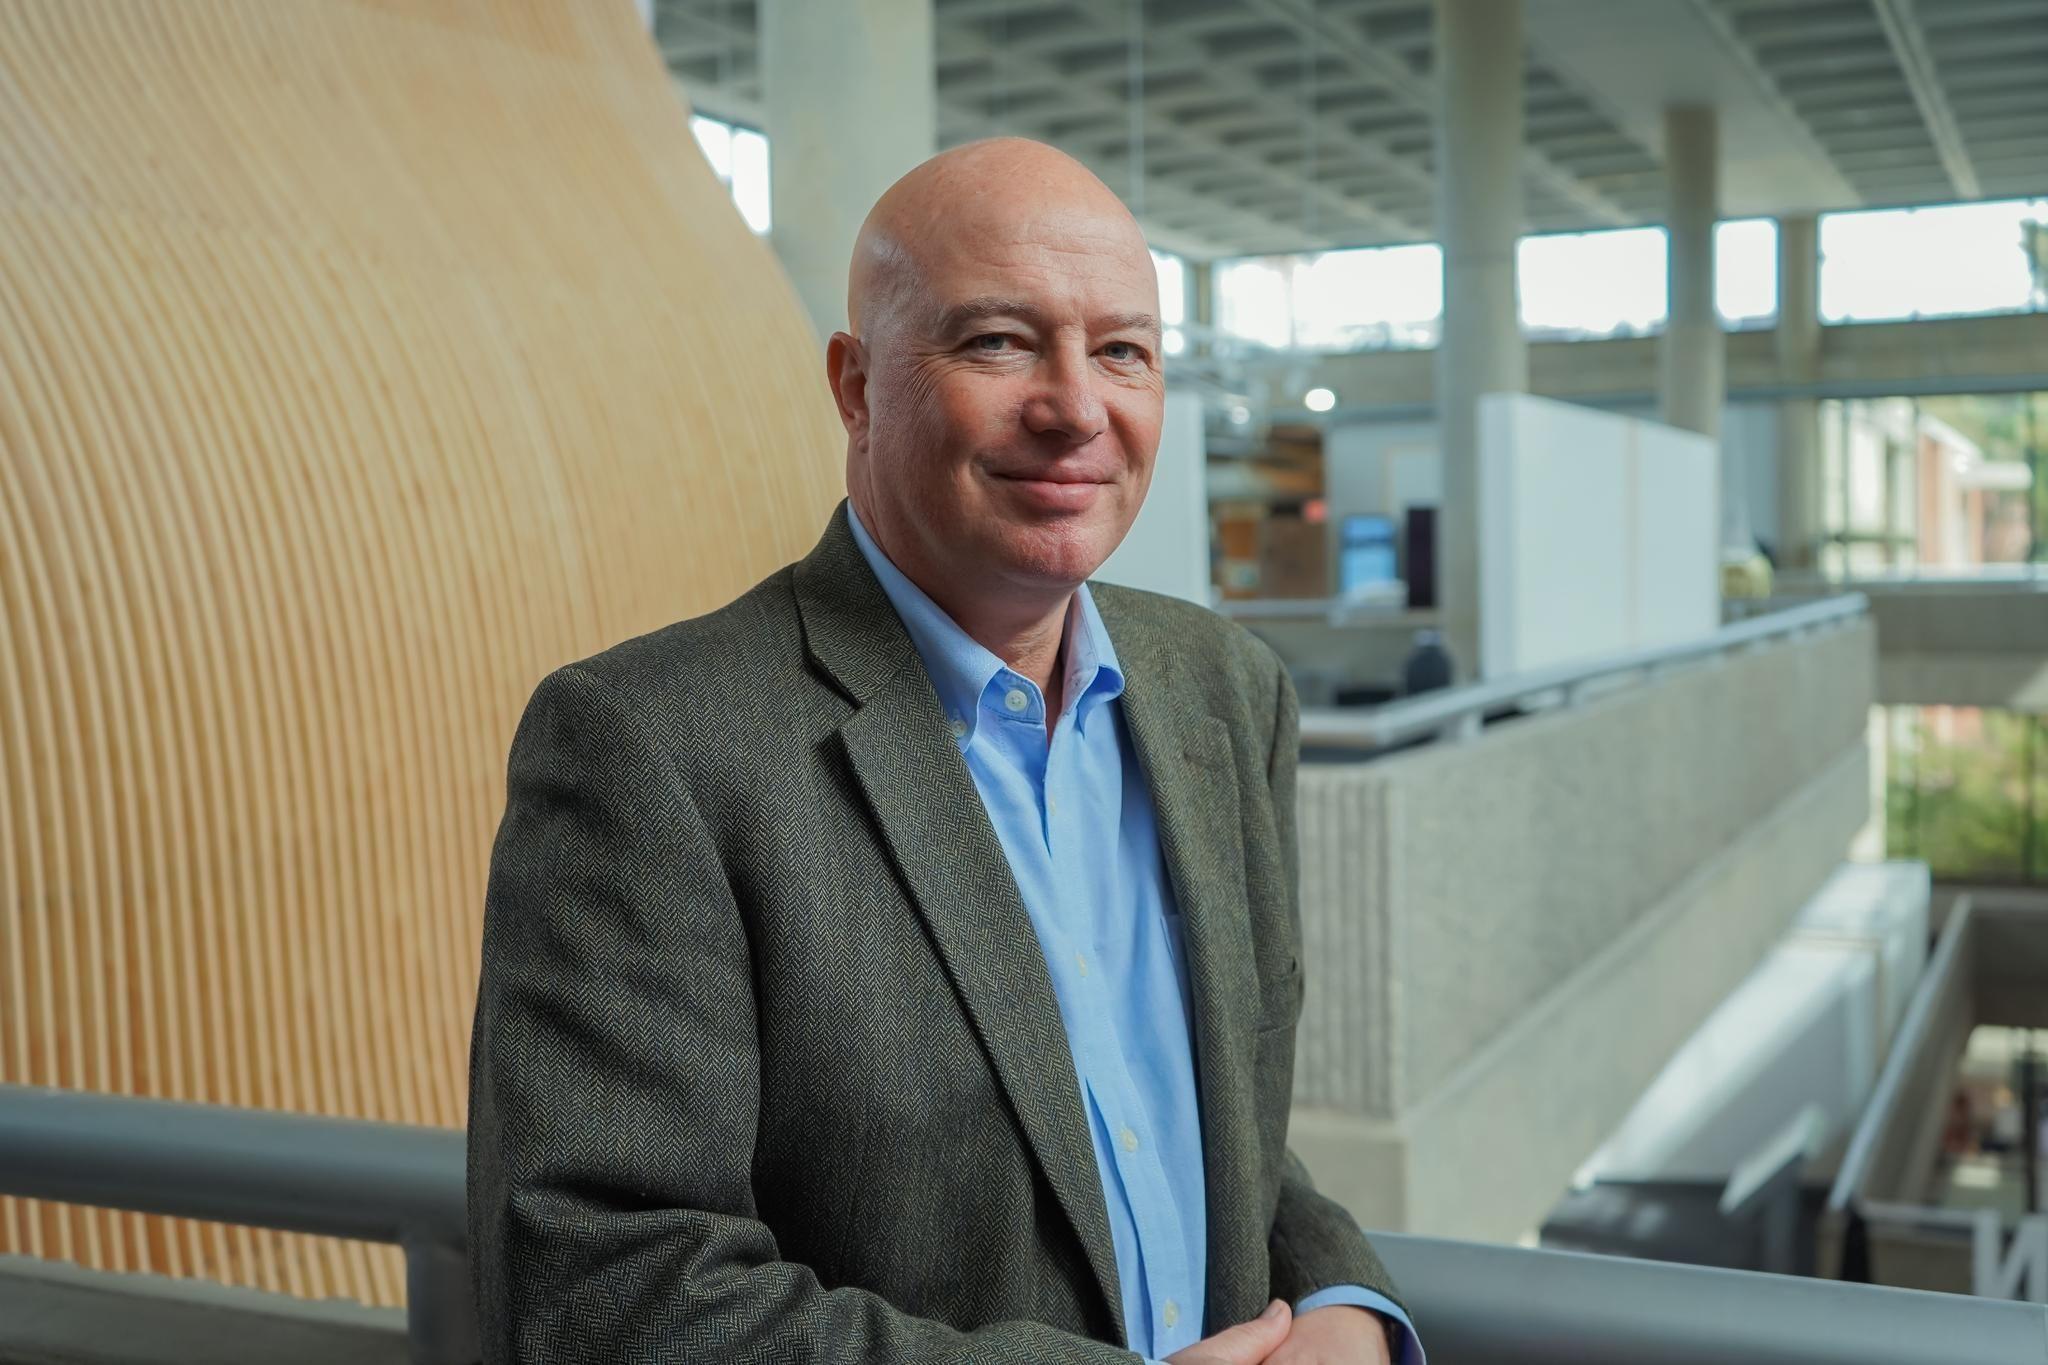 Dr. Stephen Harmon